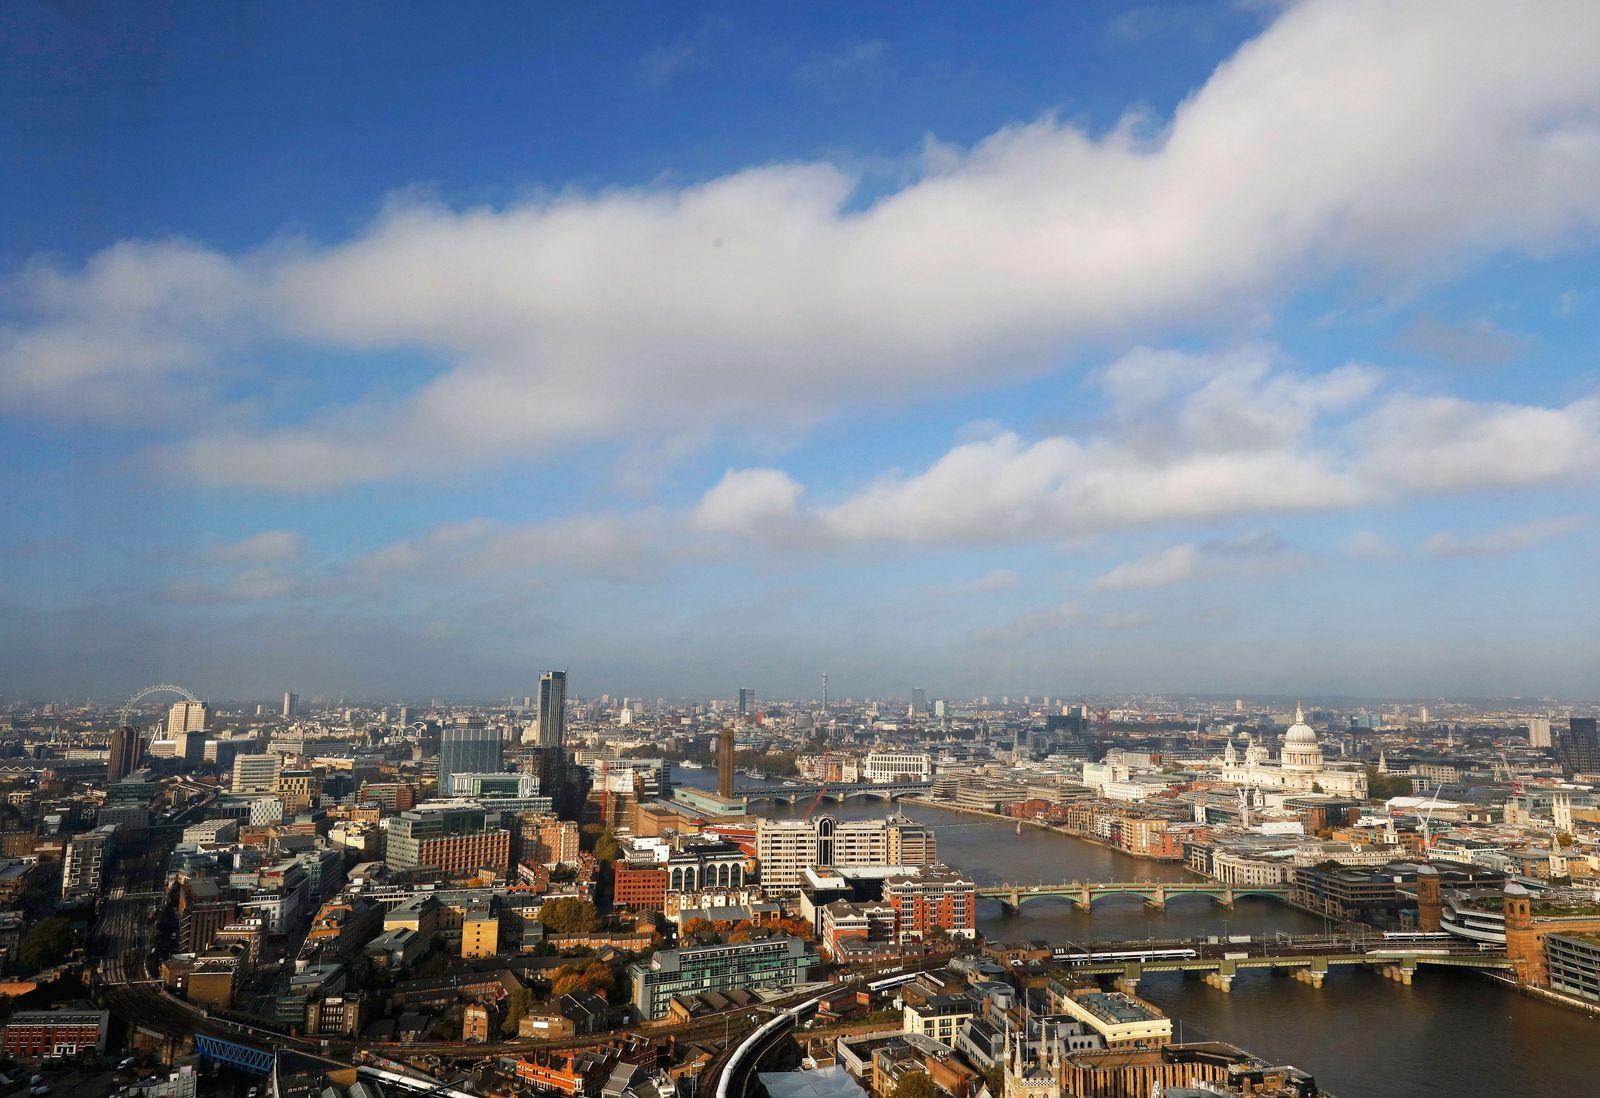 London / Skyline / London / Banken-Viertel / Banken / Banker